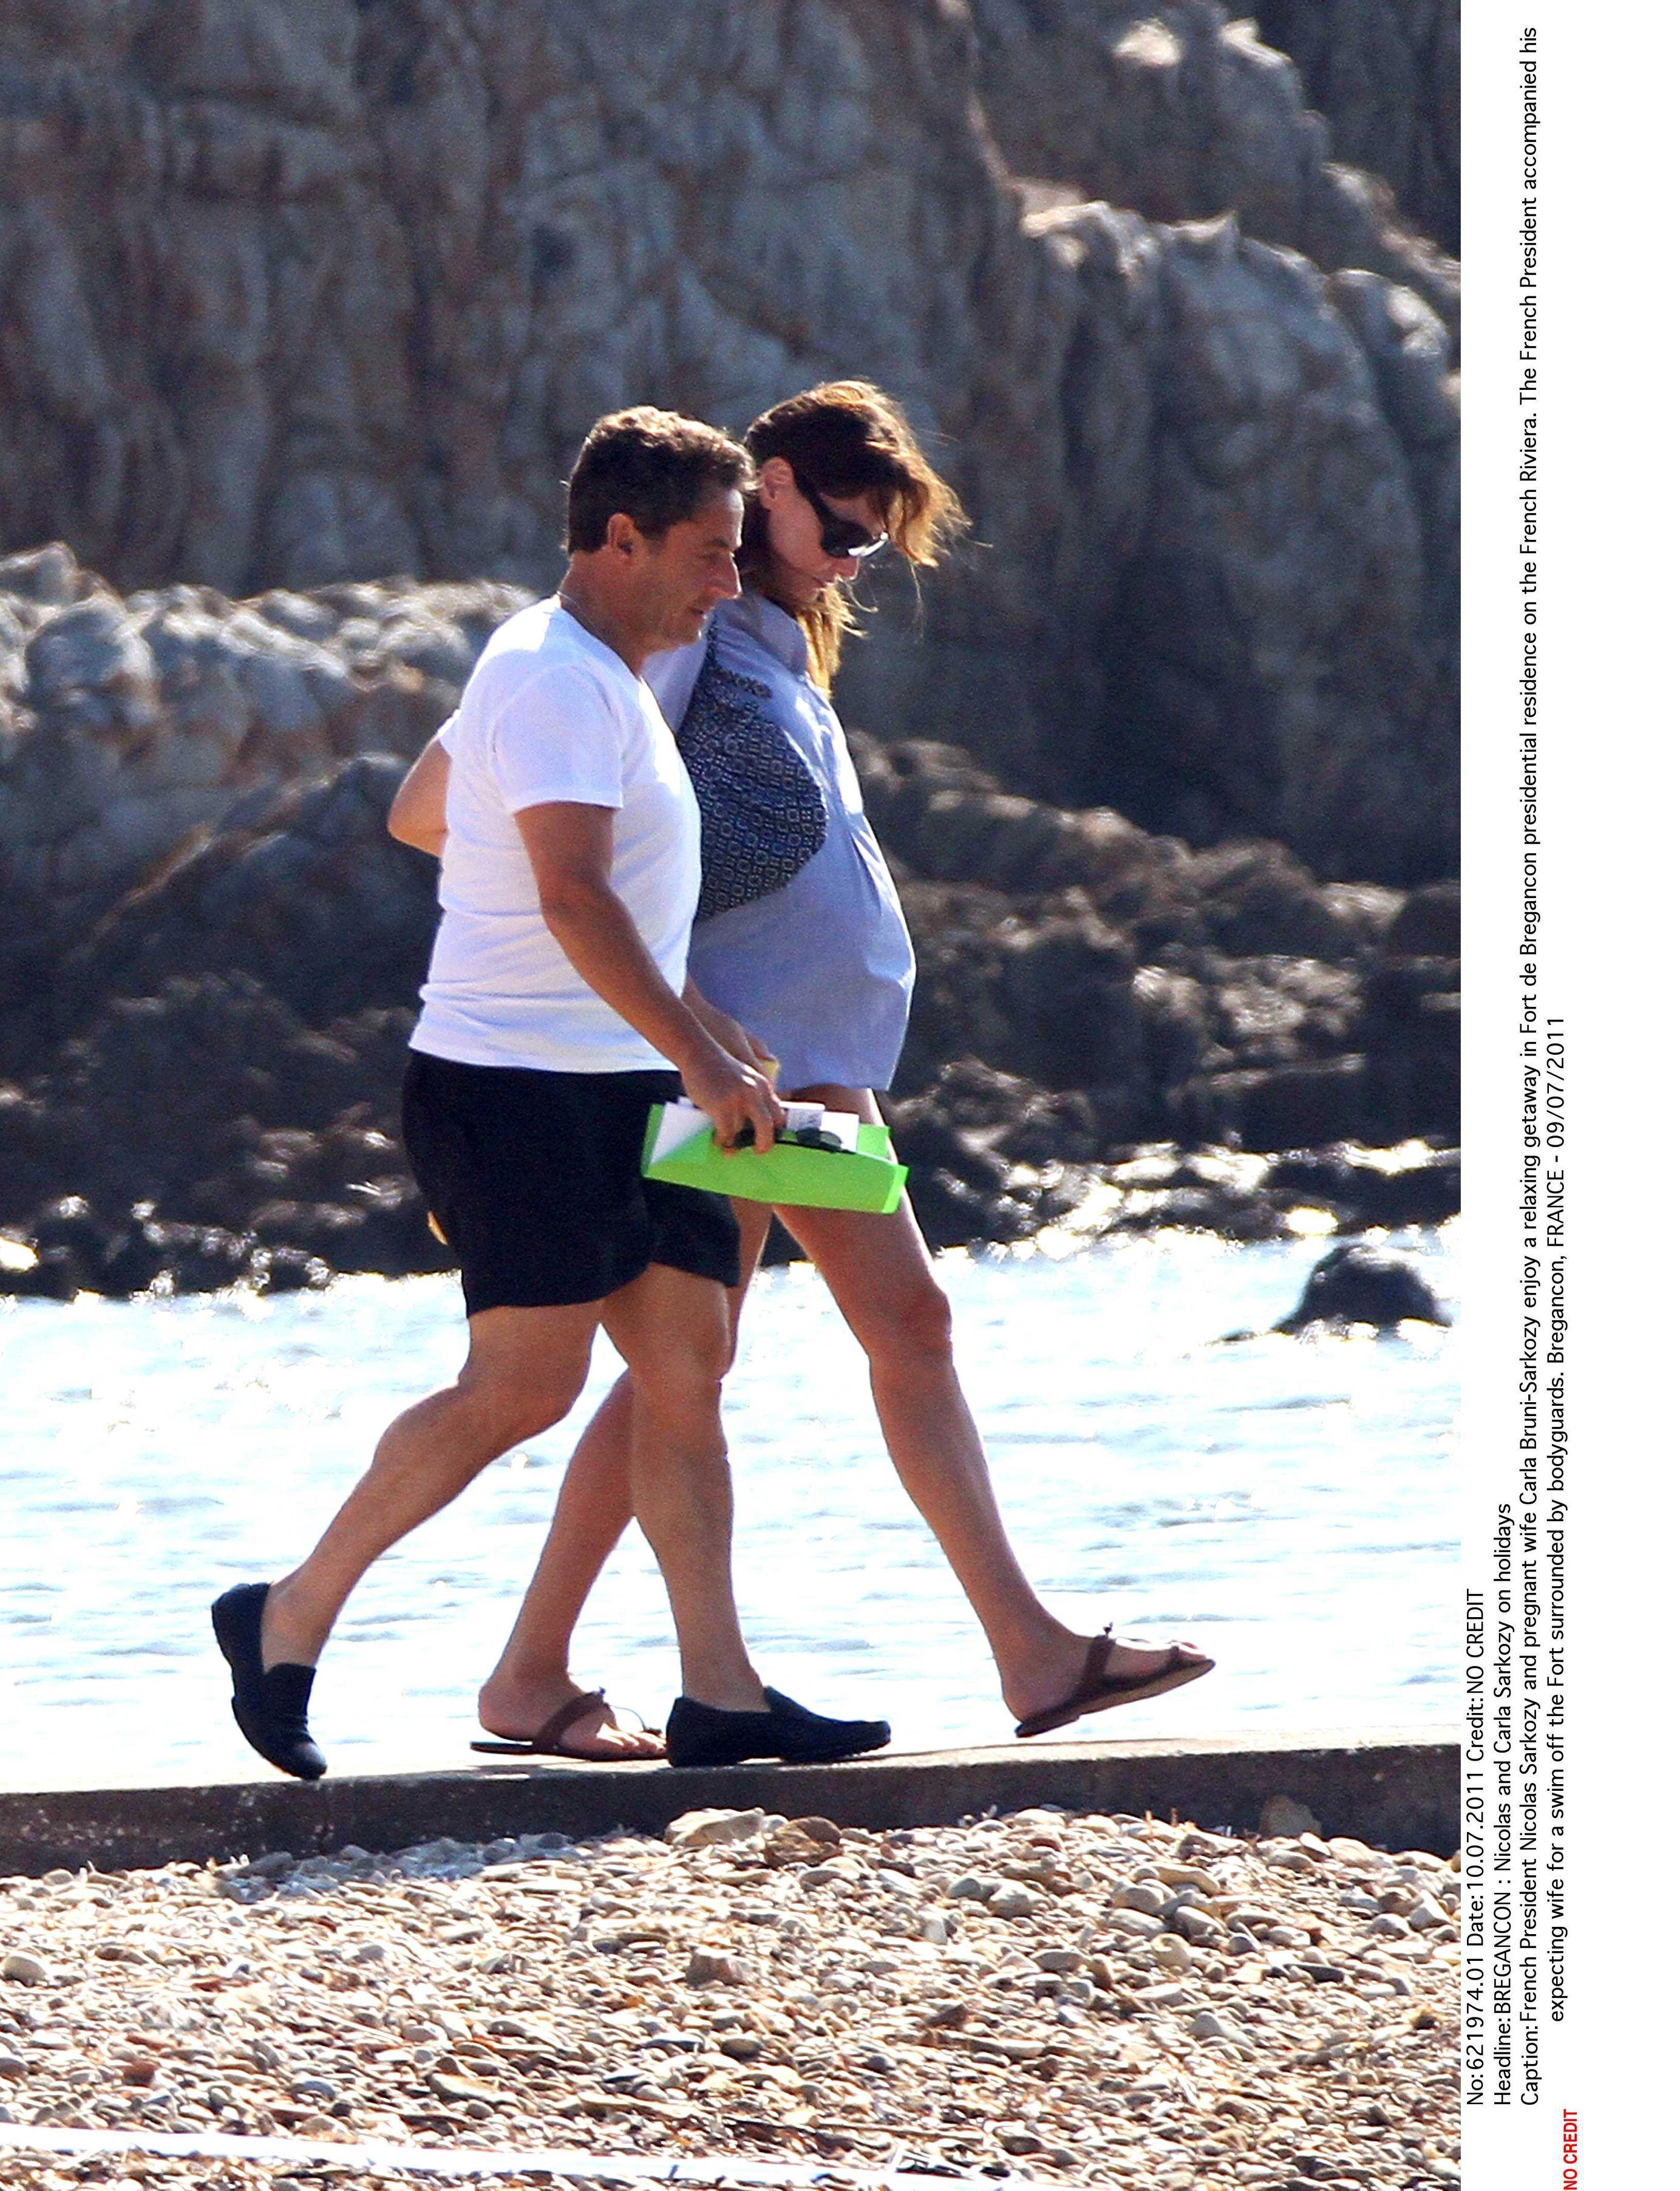 Hollande Vs Sarkozy Le Match Des Vacances Photos